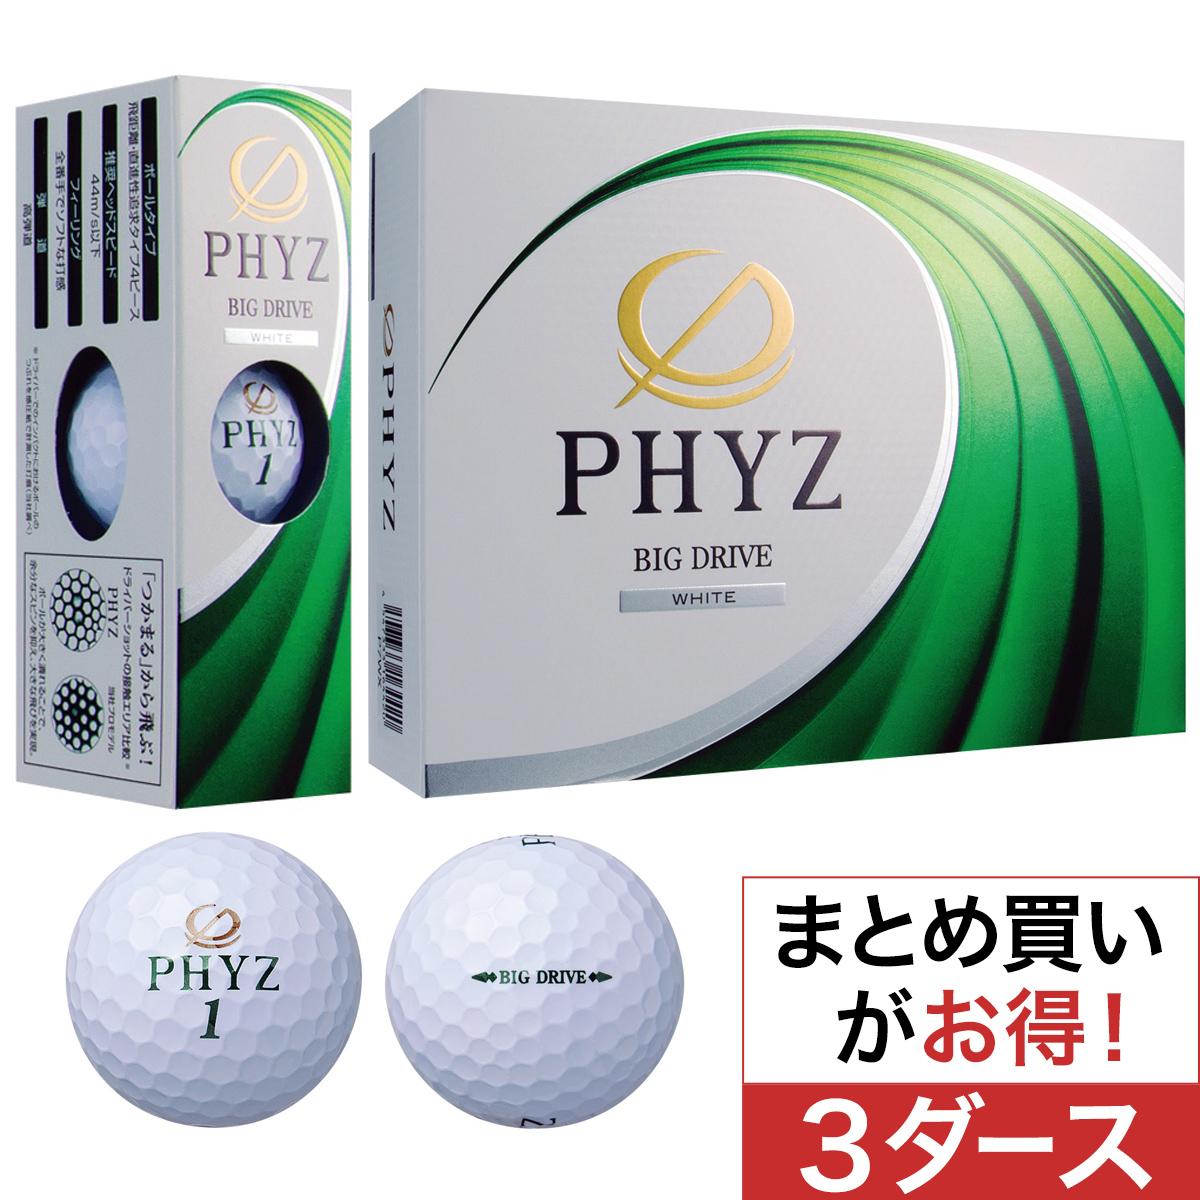 PHYZ ボール 2017年モデル 3ダースセット